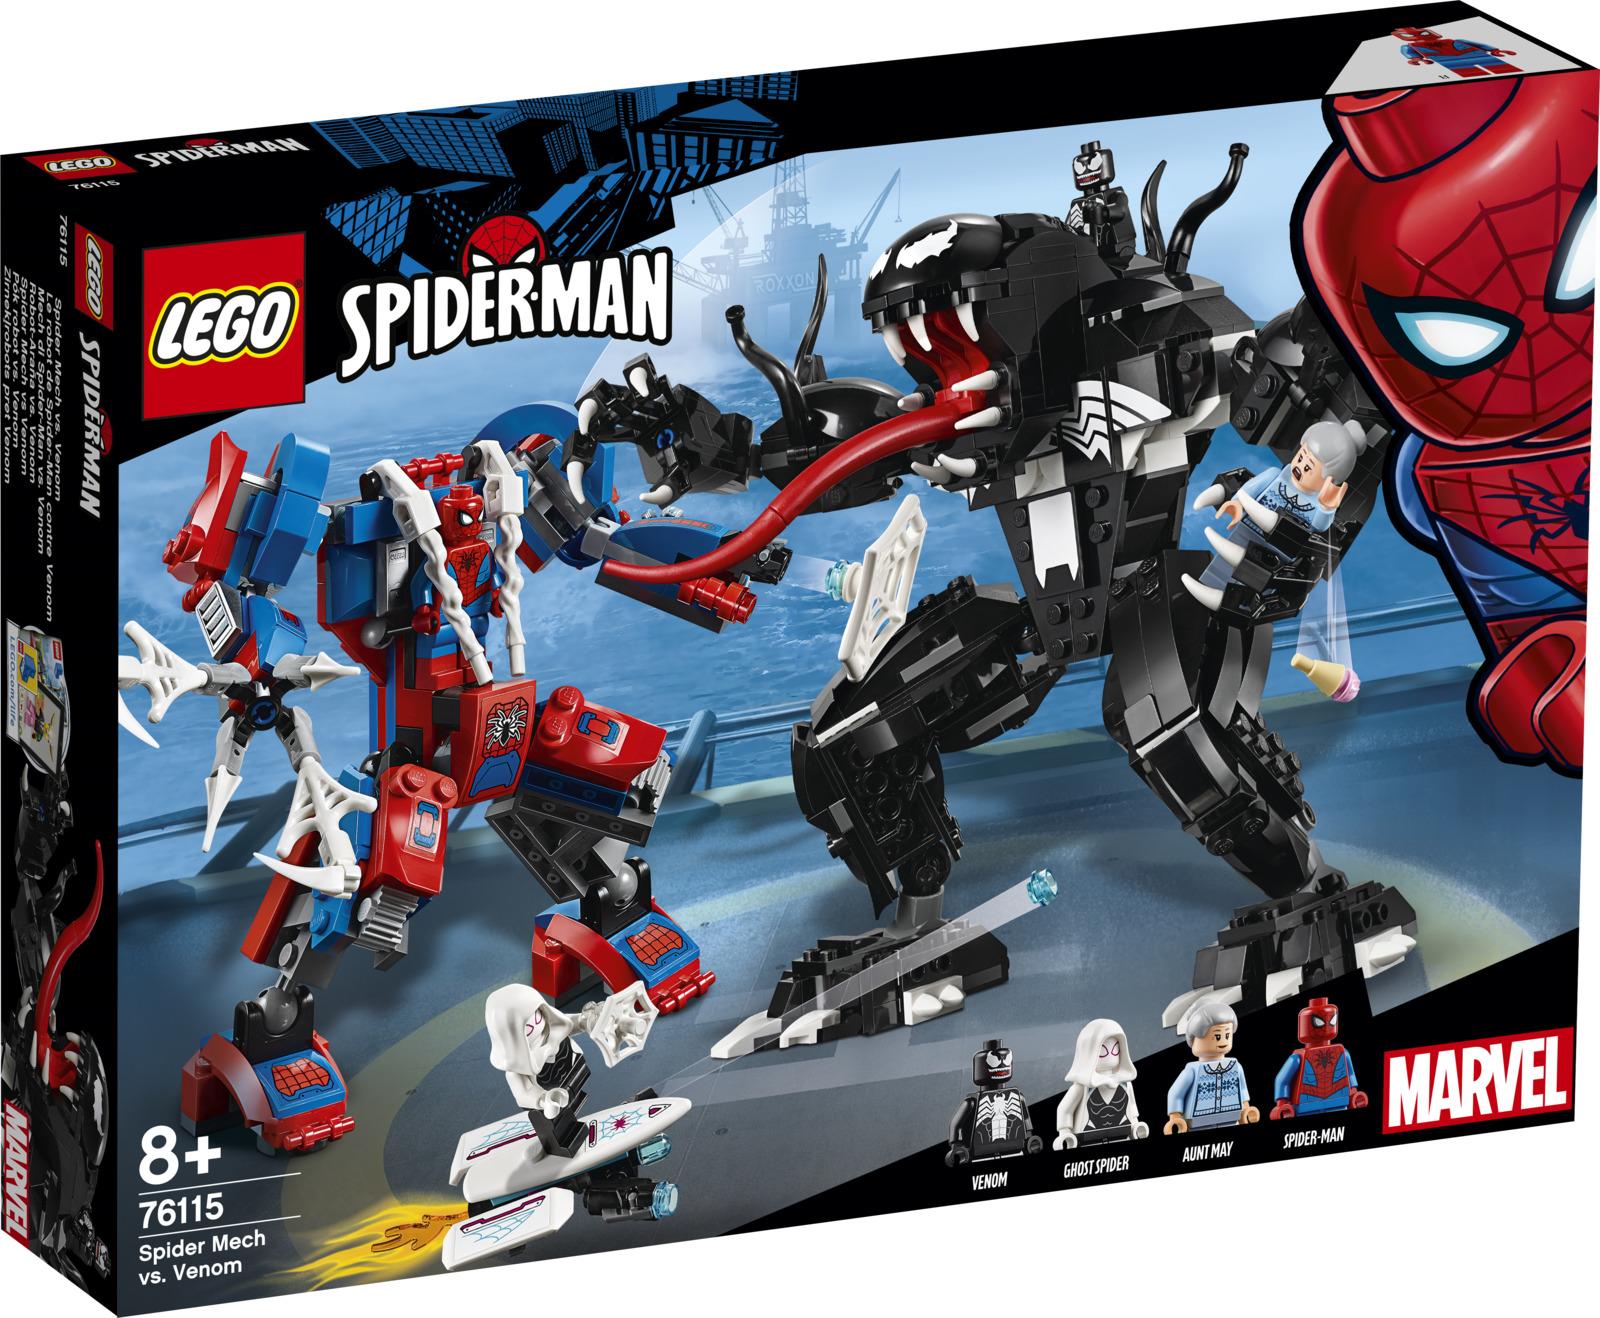 LEGO Super Heroes Marvel 76115 Человек-паук против Венома Конструктор конструктор lego решающий бой человека паука против скорпиона 125 элементов 10754